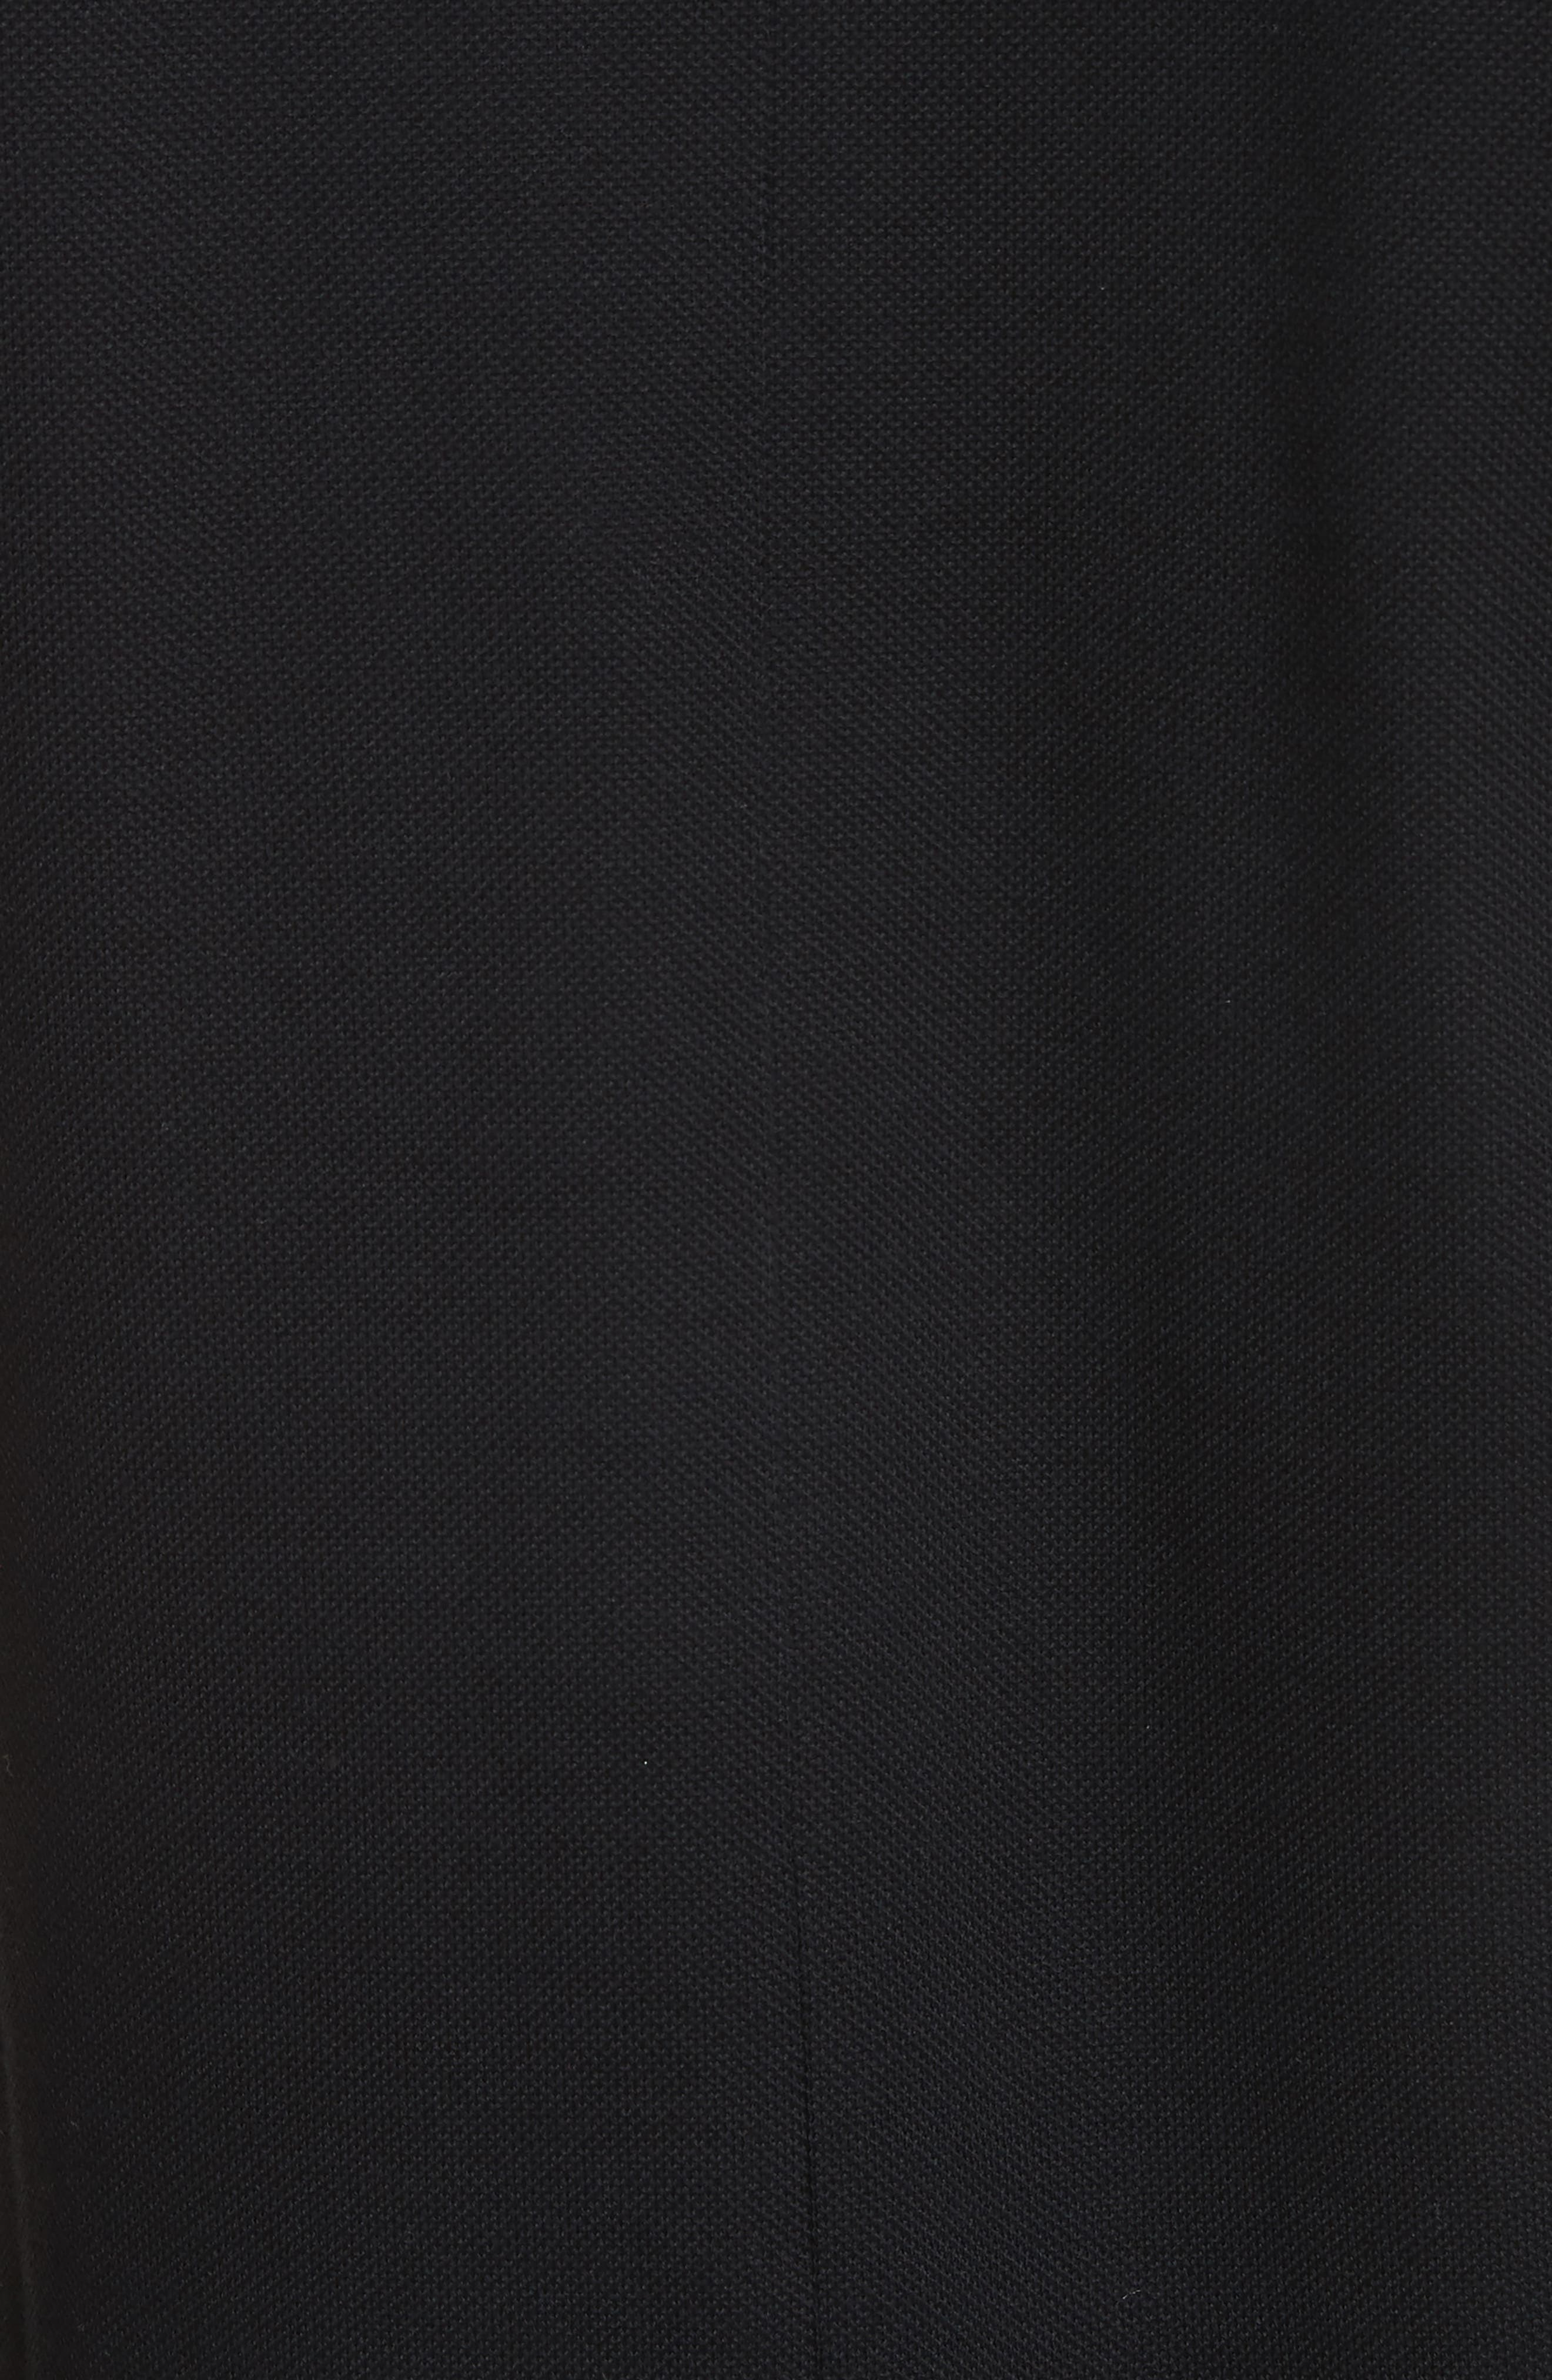 Givenchcy Logo Polo Shirt,                             Alternate thumbnail 5, color,                             Black